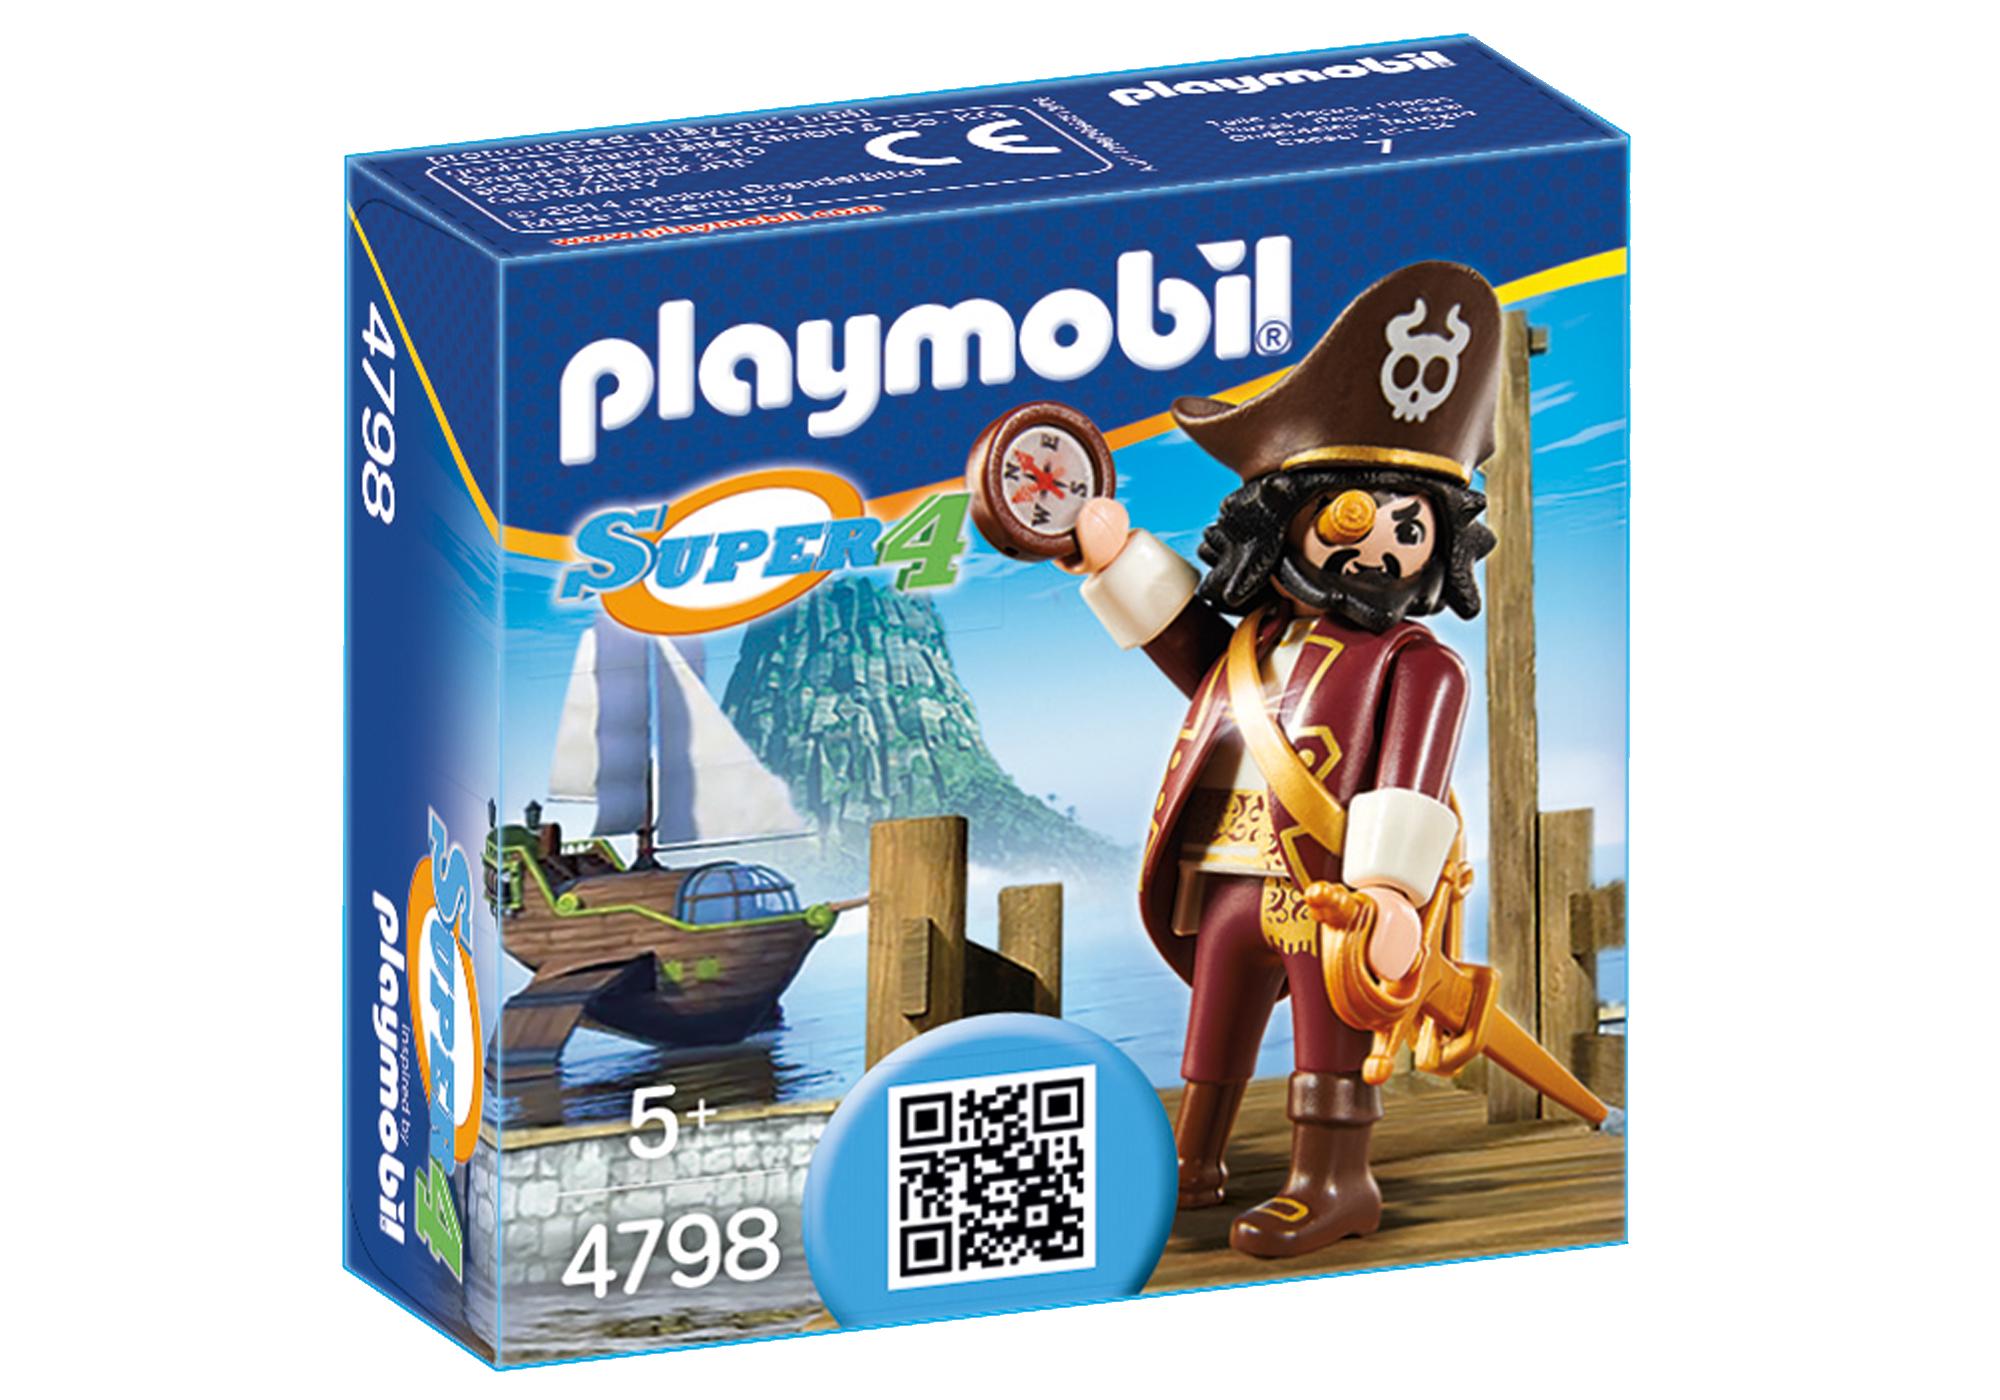 http://media.playmobil.com/i/playmobil/4798_product_box_front